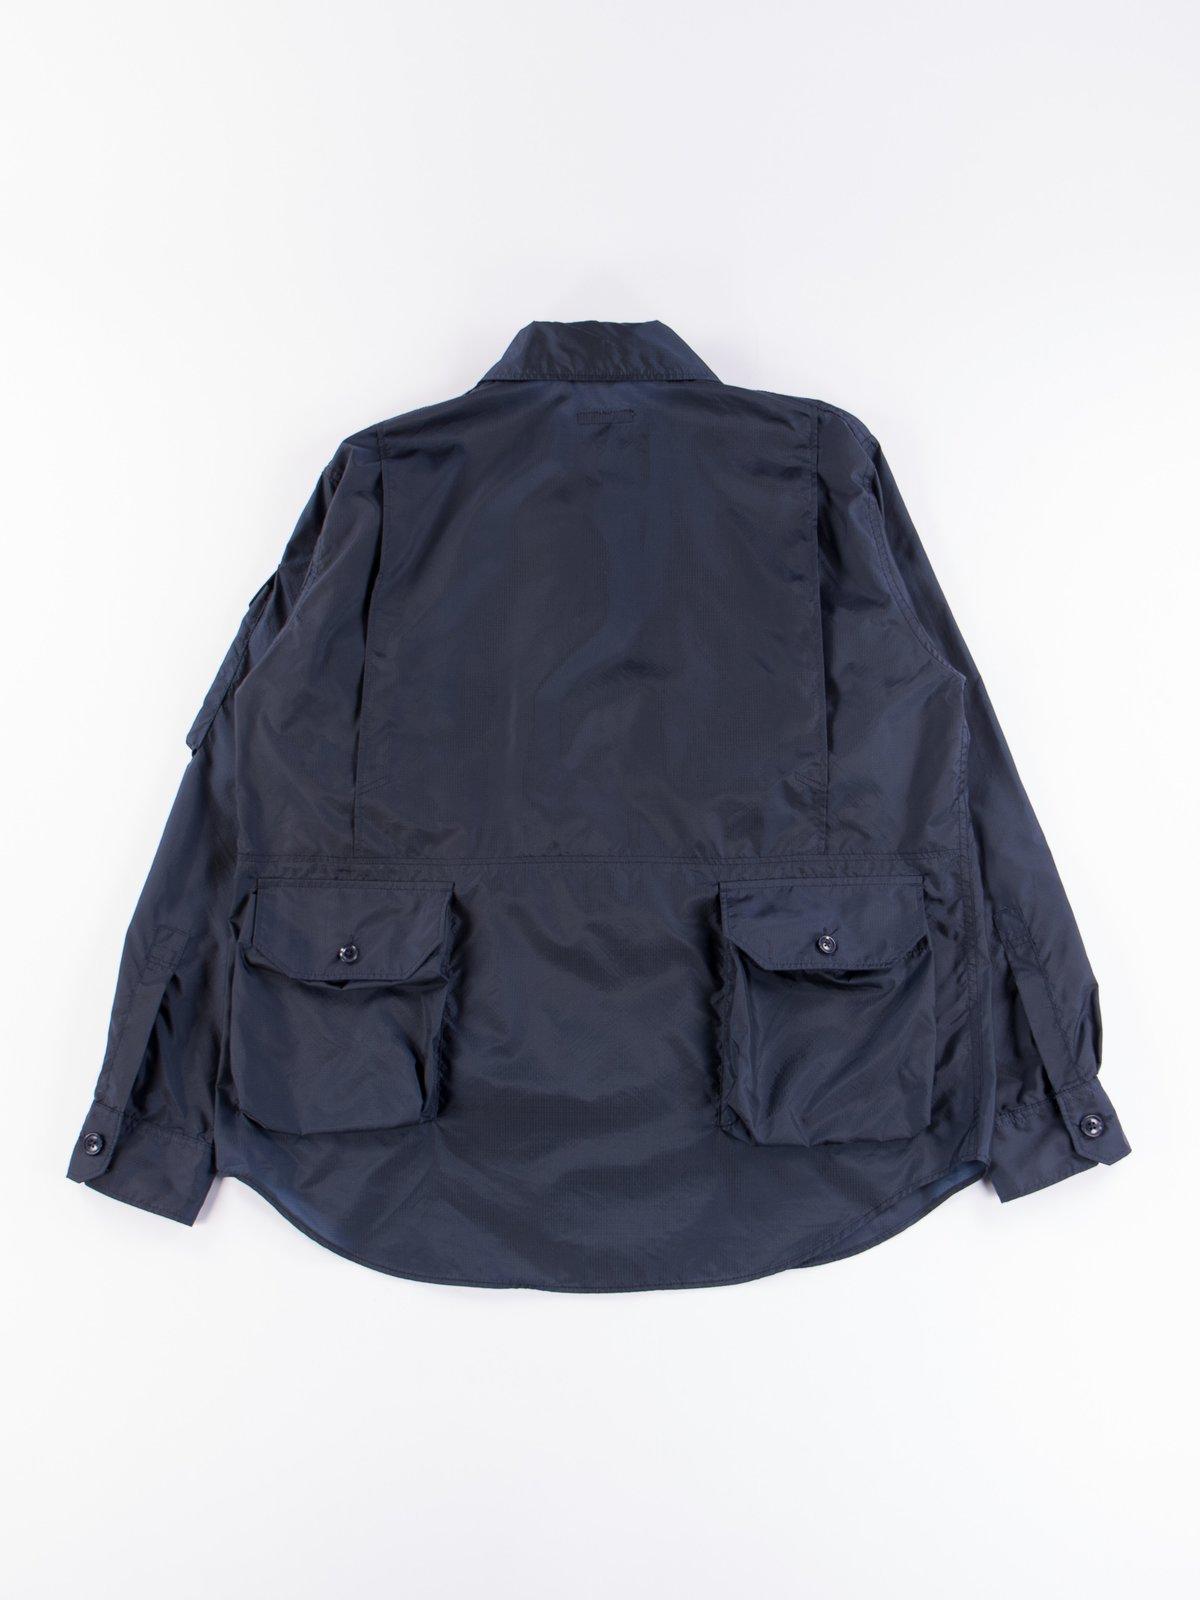 Navy Nylon Micro Ripstop Explorer Shirt Jacket  - Image 7